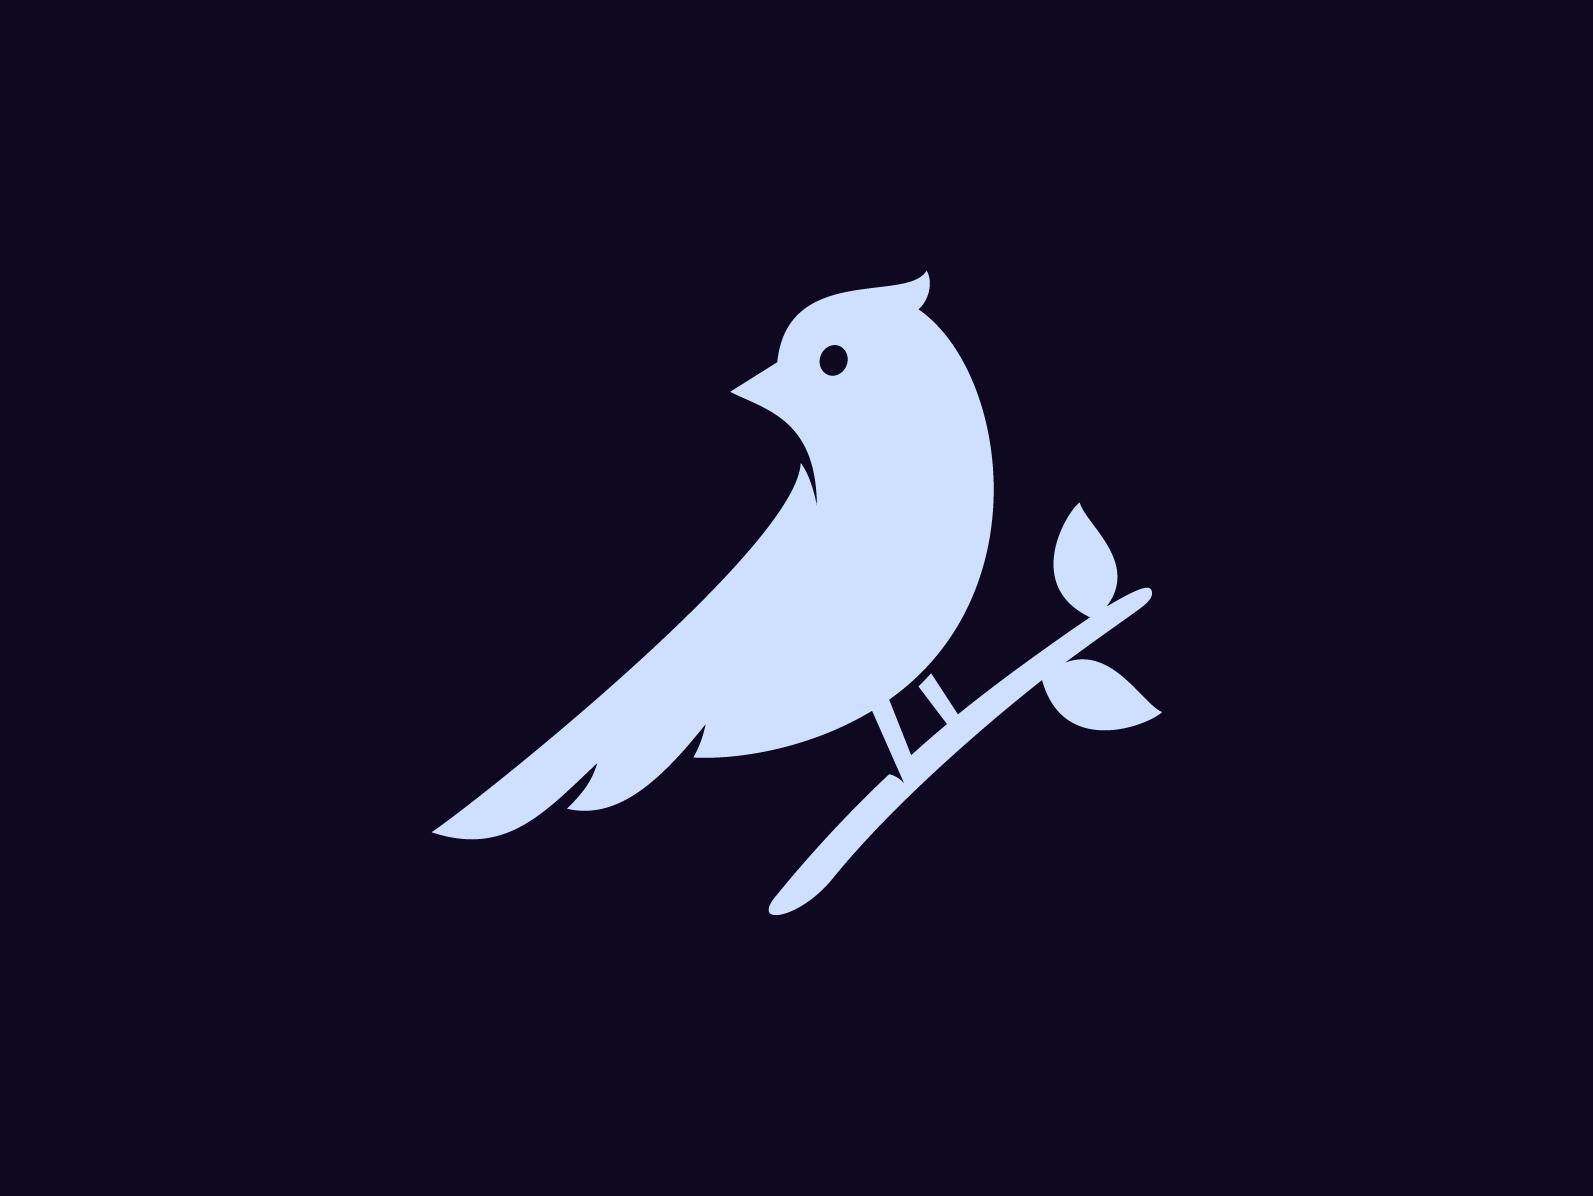 Unused Bird 2 – Improved concept wings symbol unused propsal mark logo leaf identity grow branch bird beak animal